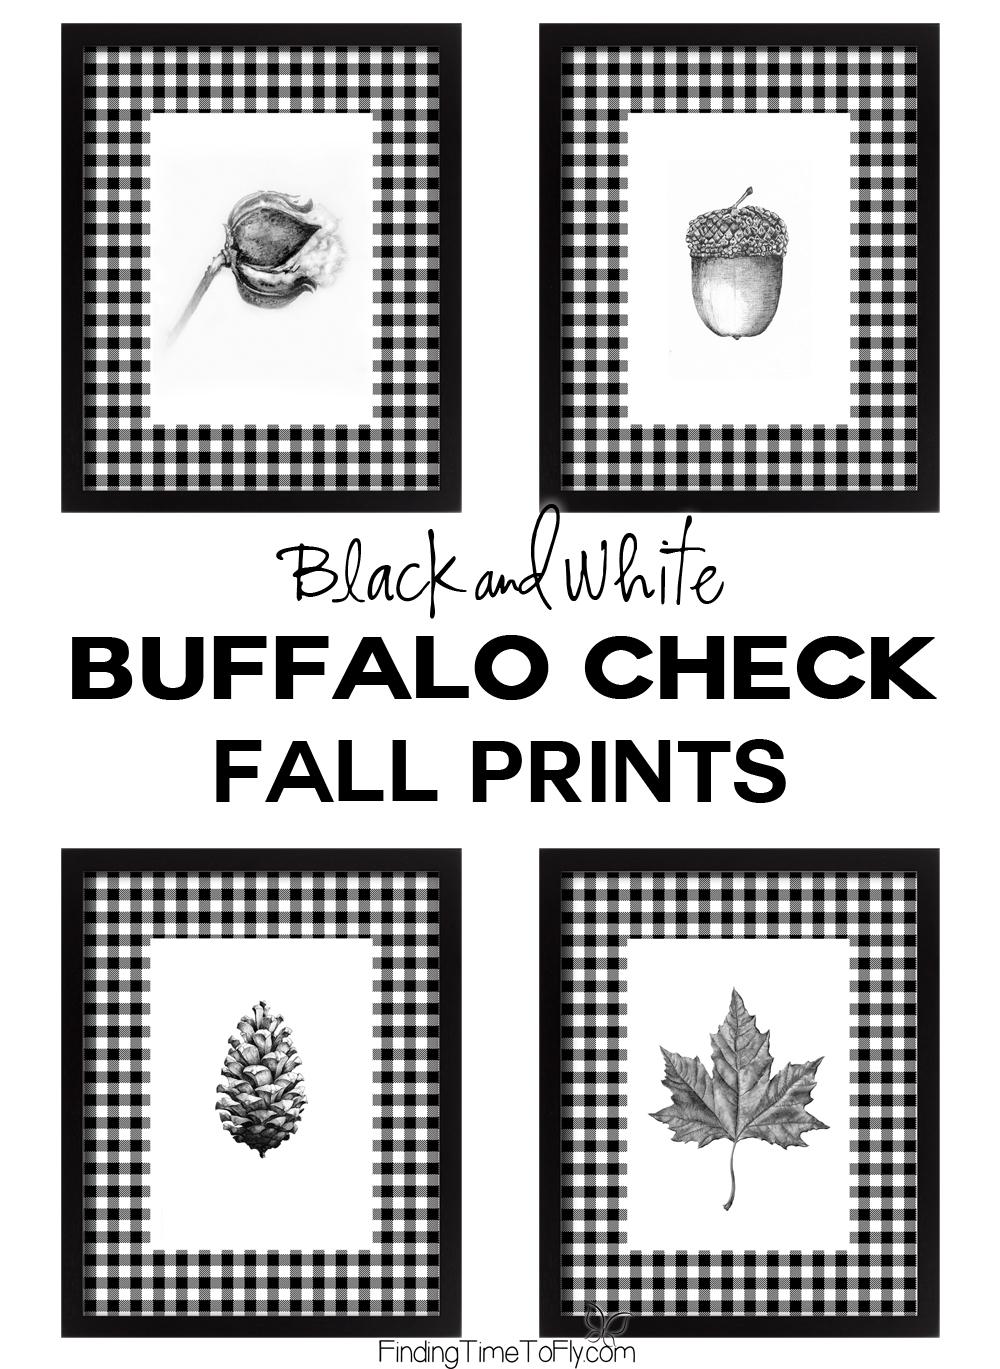 Black and White Buffalo Check Fall Prints